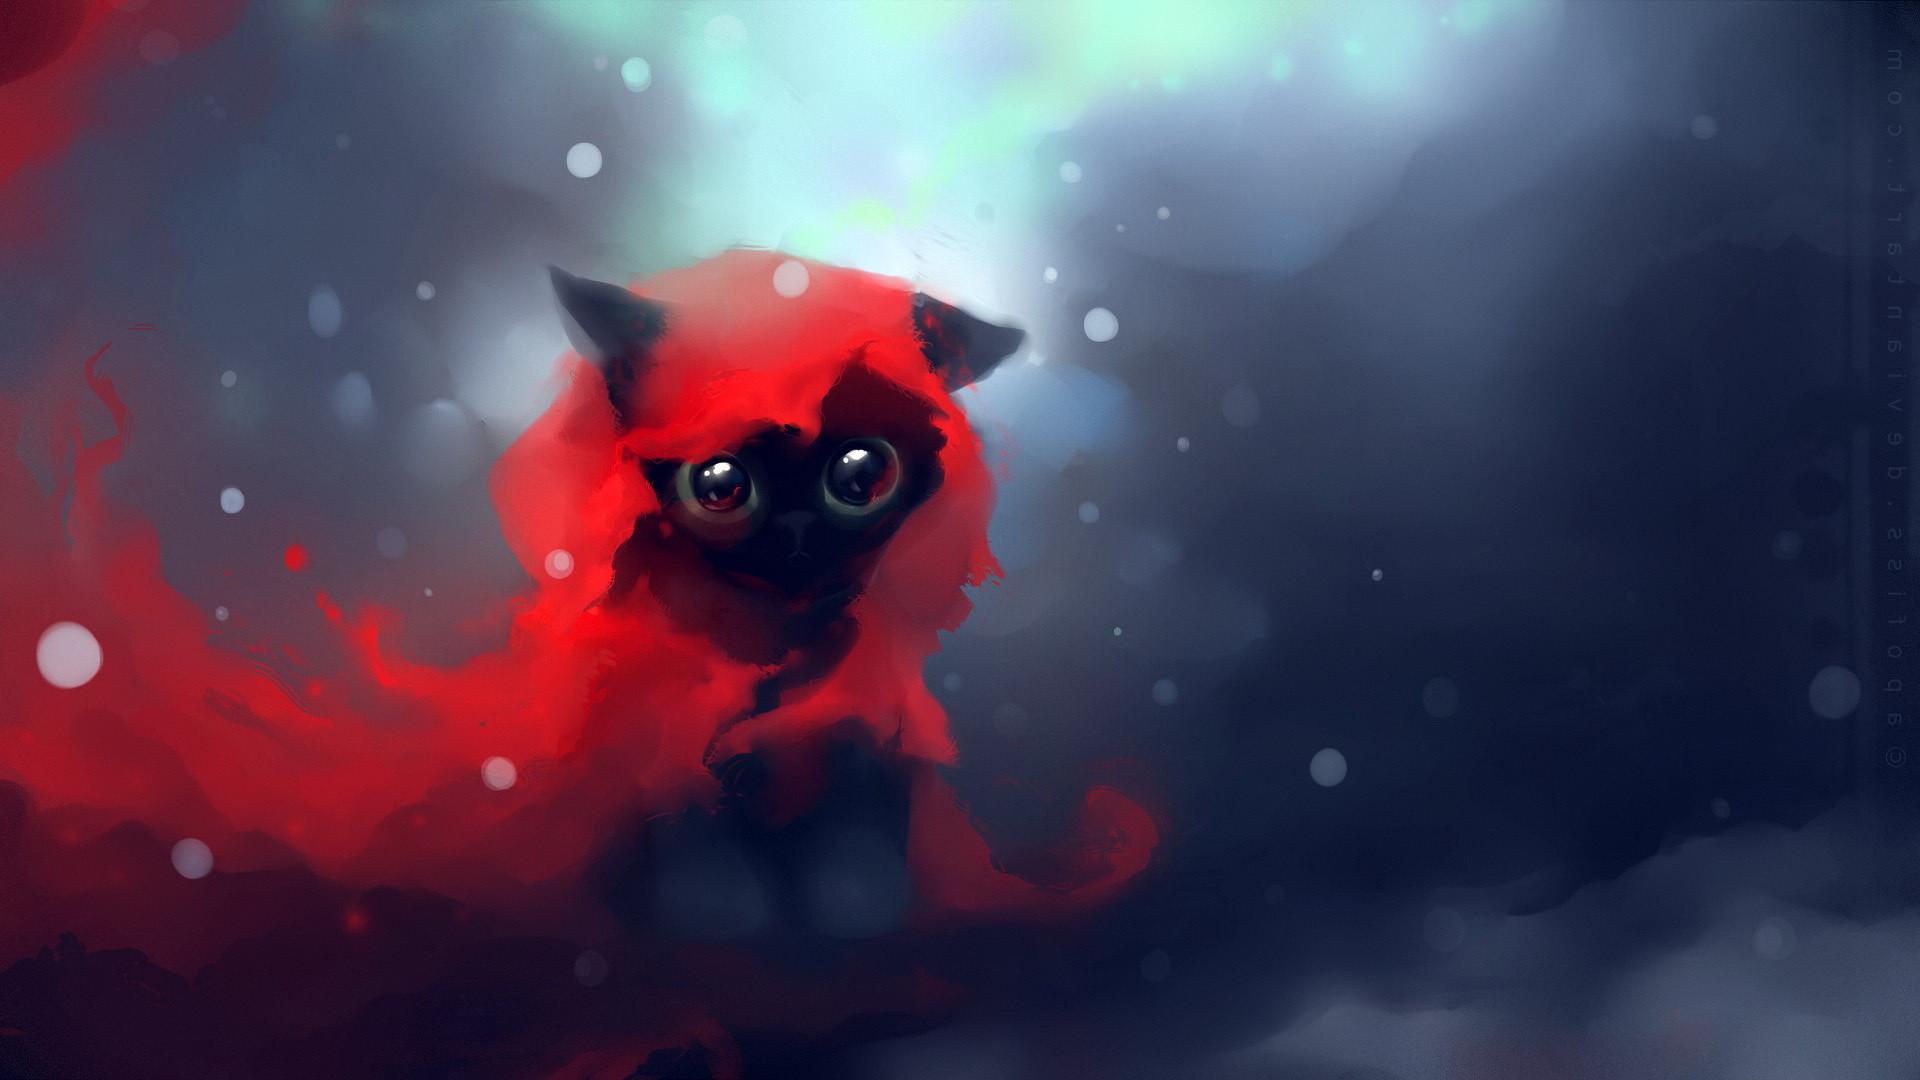 Little Red Yin by Apofiss of Deviantart